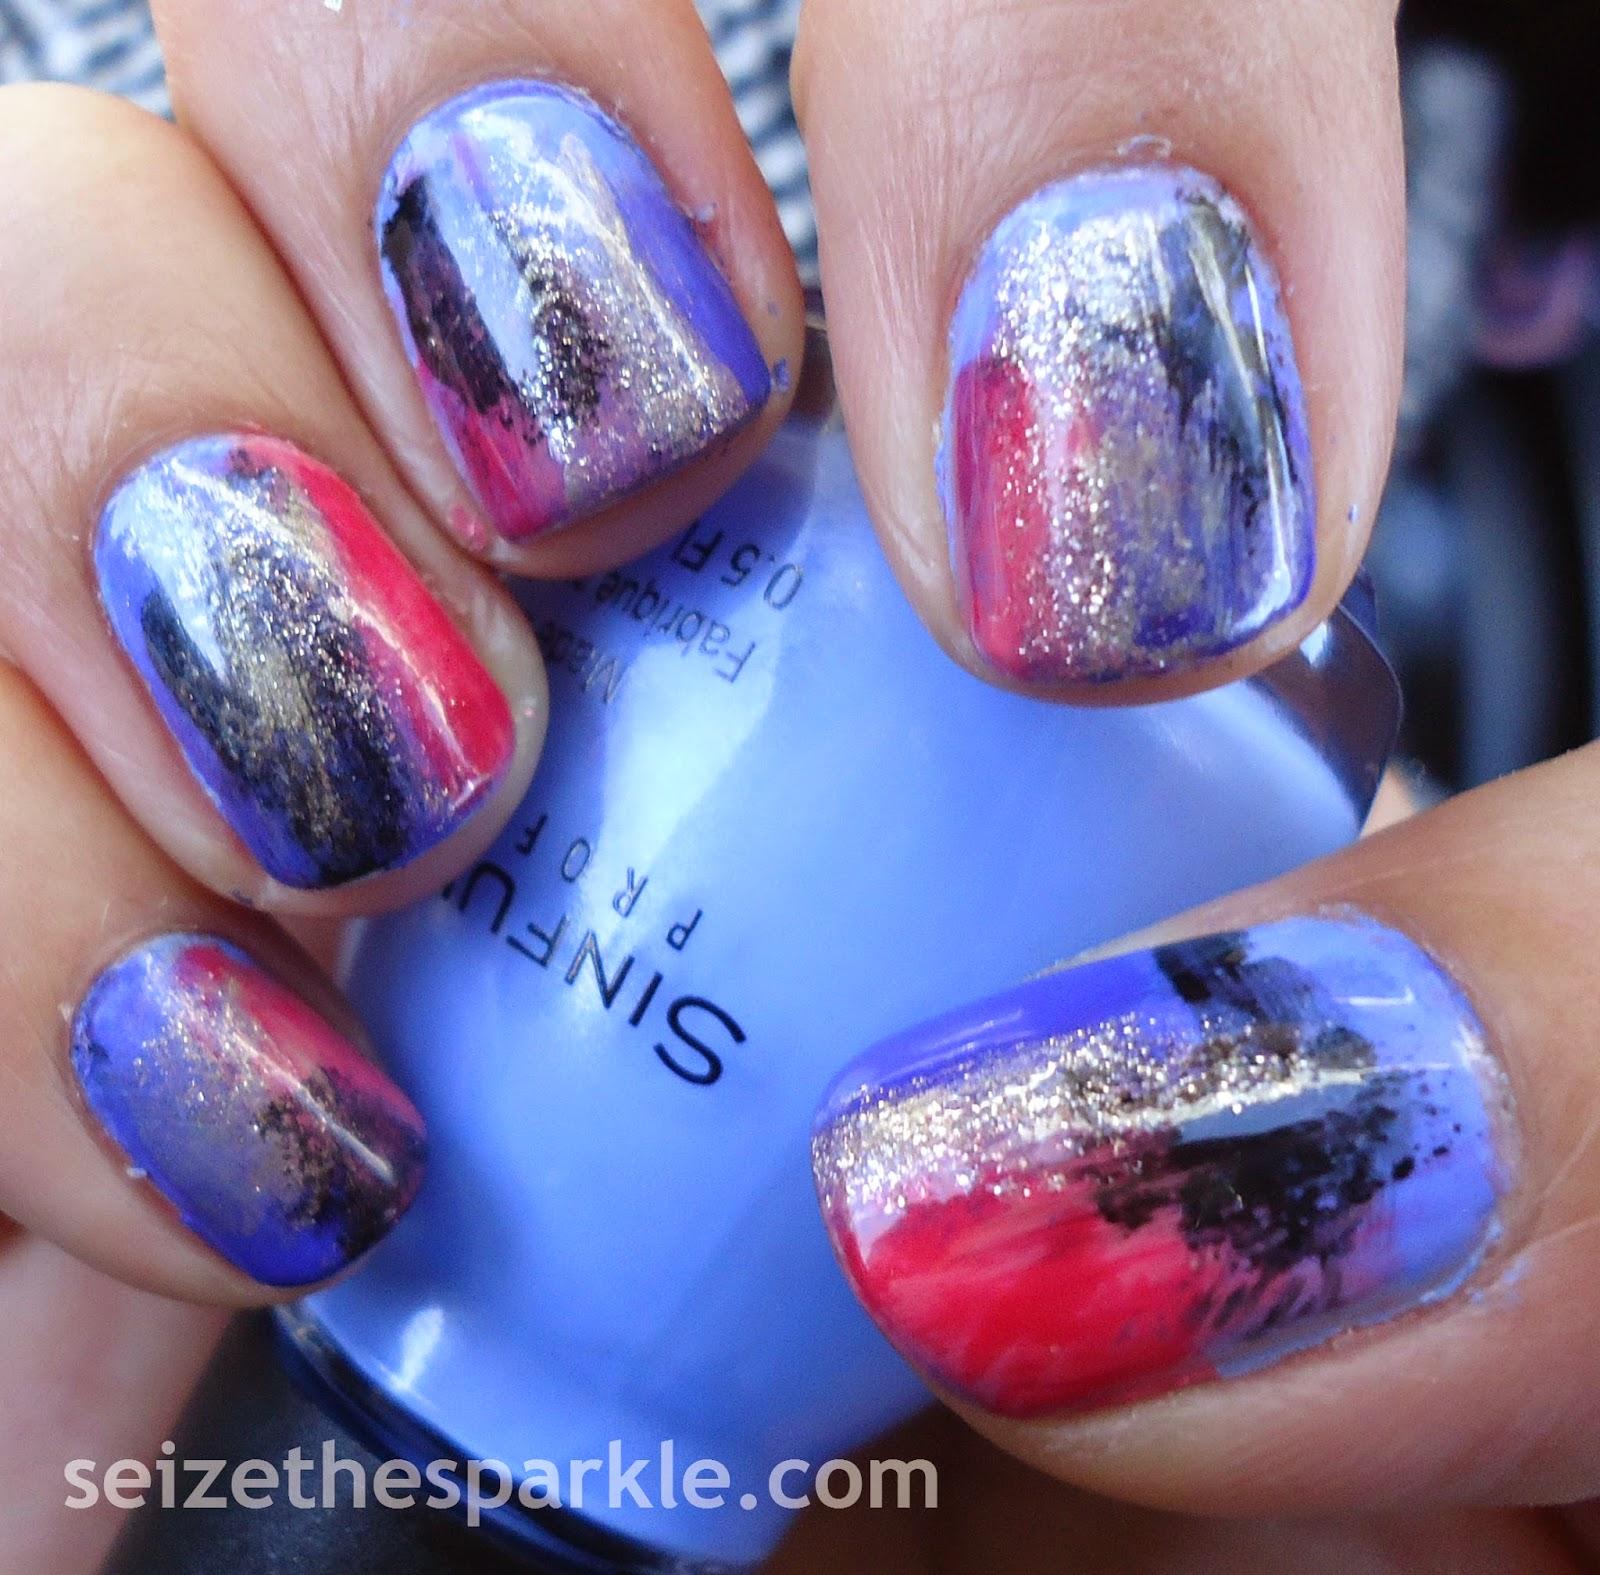 Seriotype Sponging Manicure